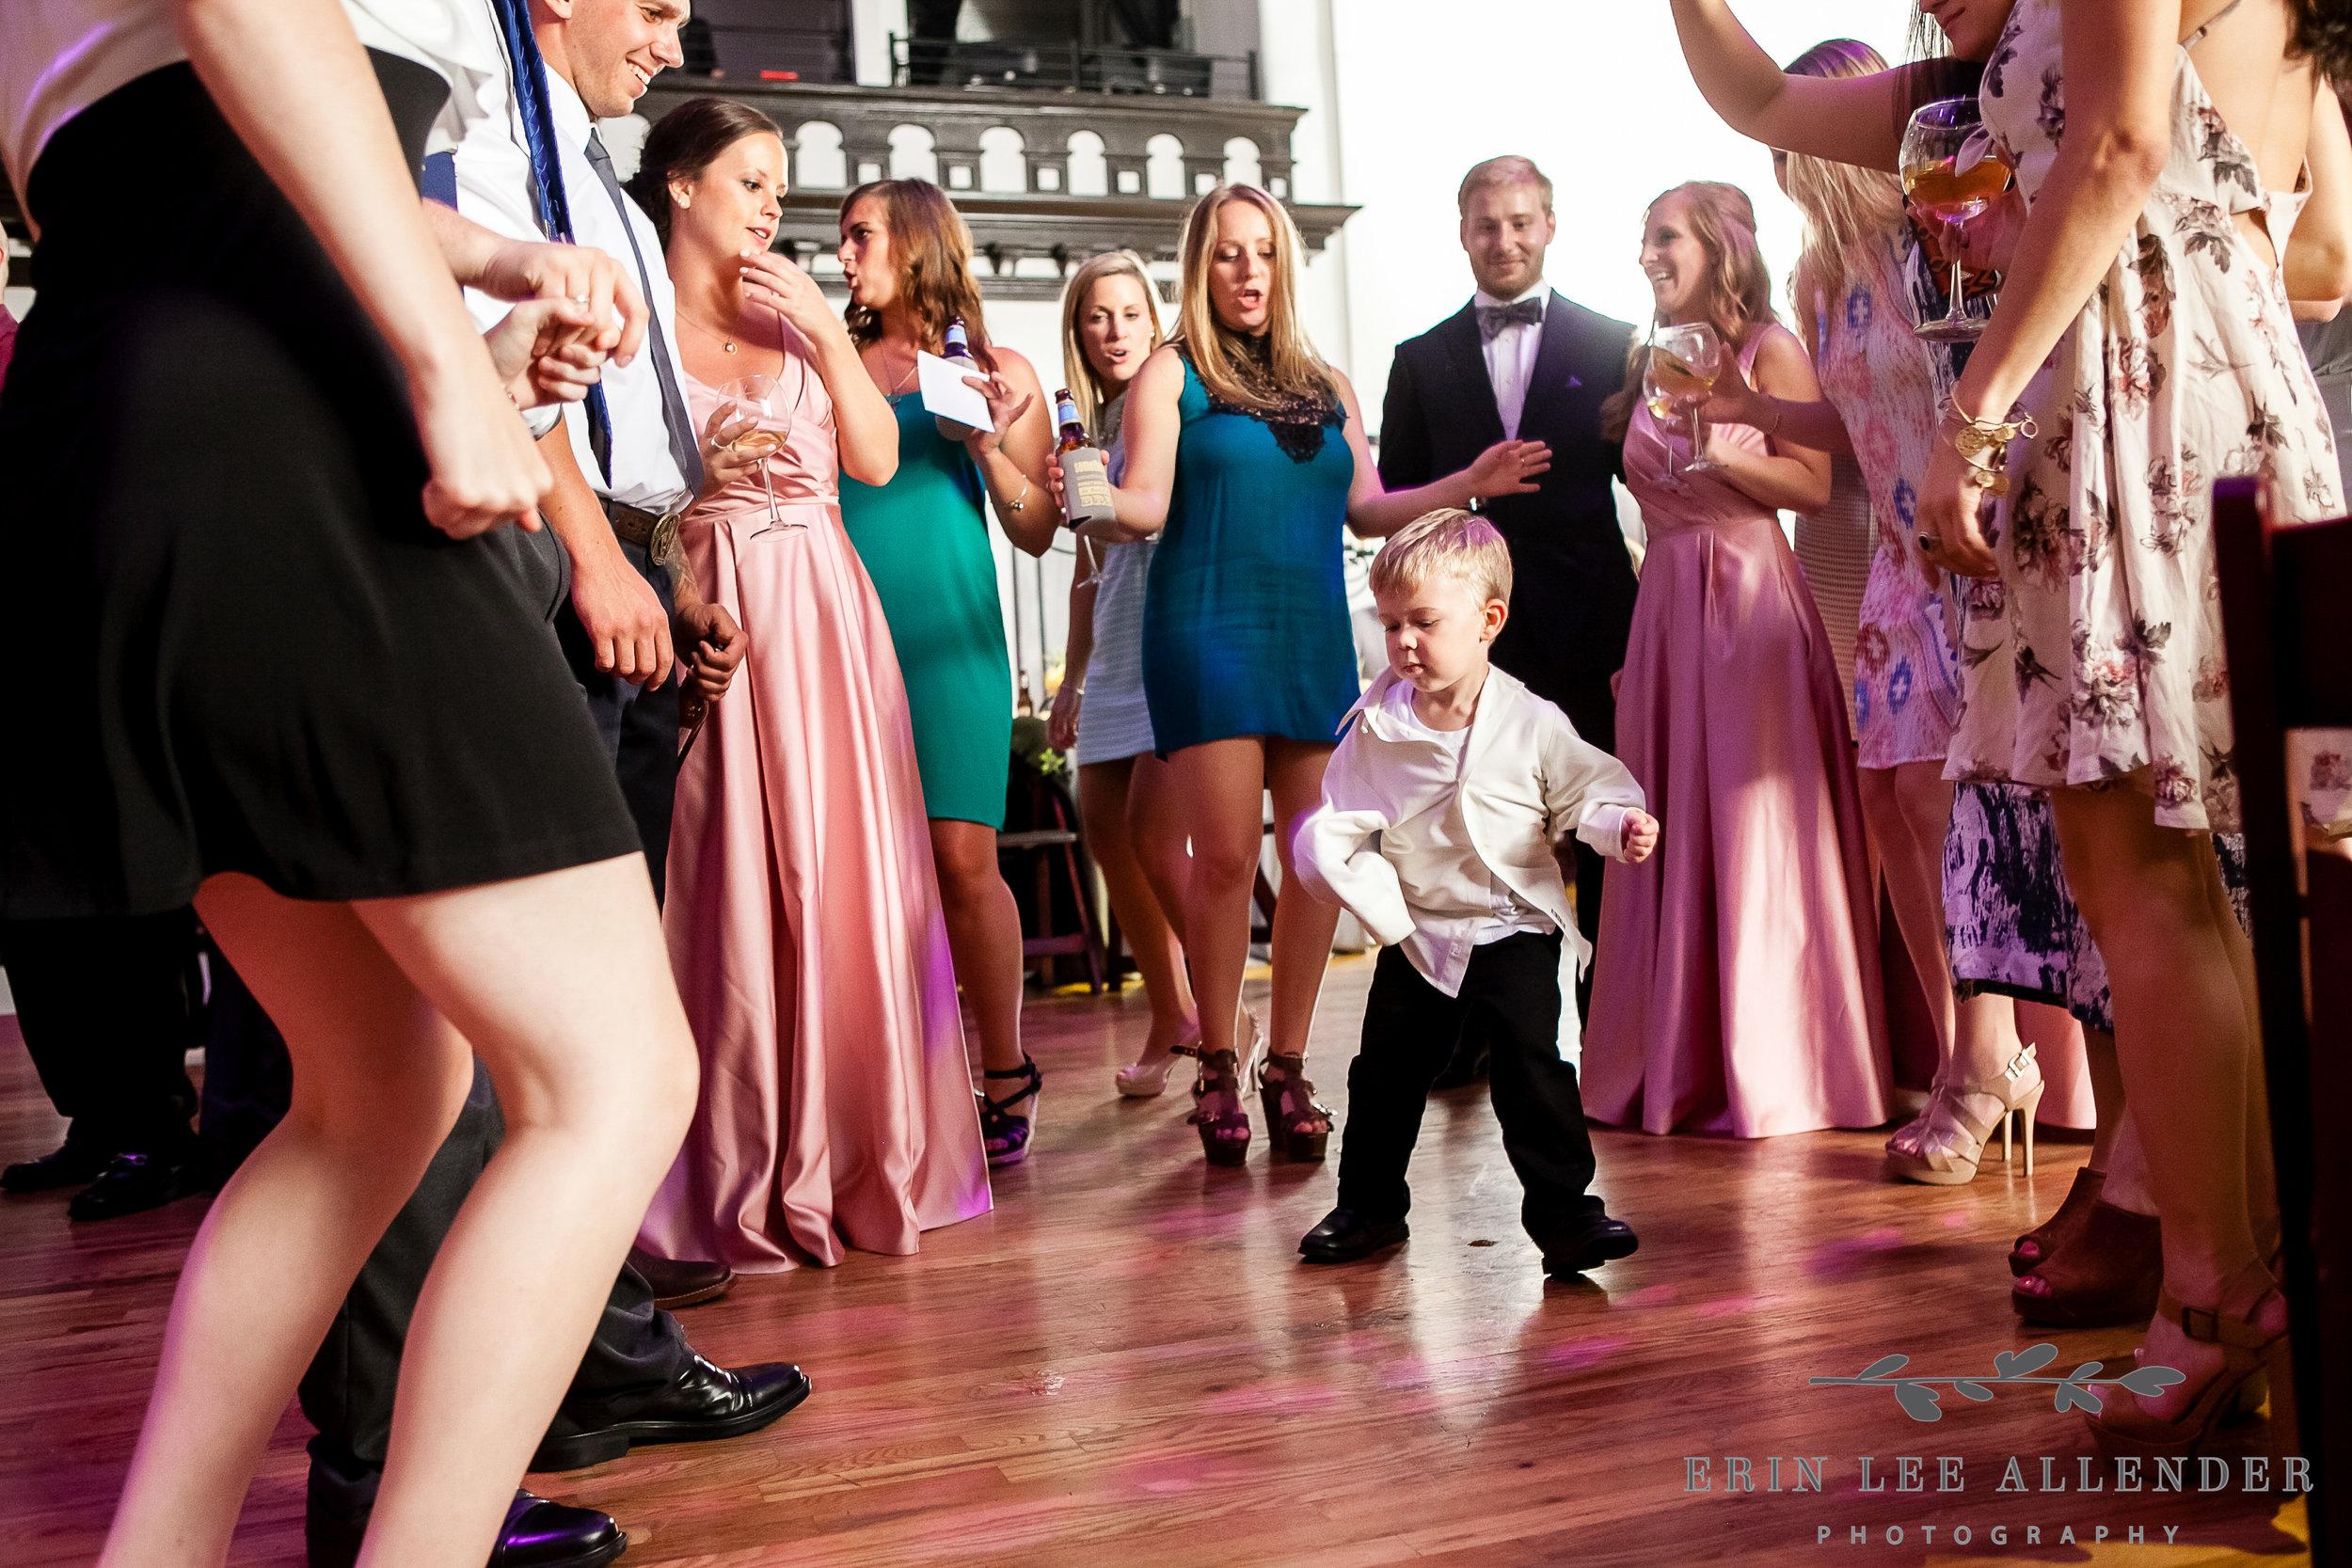 Ring_Bearer_Dancing_Reception